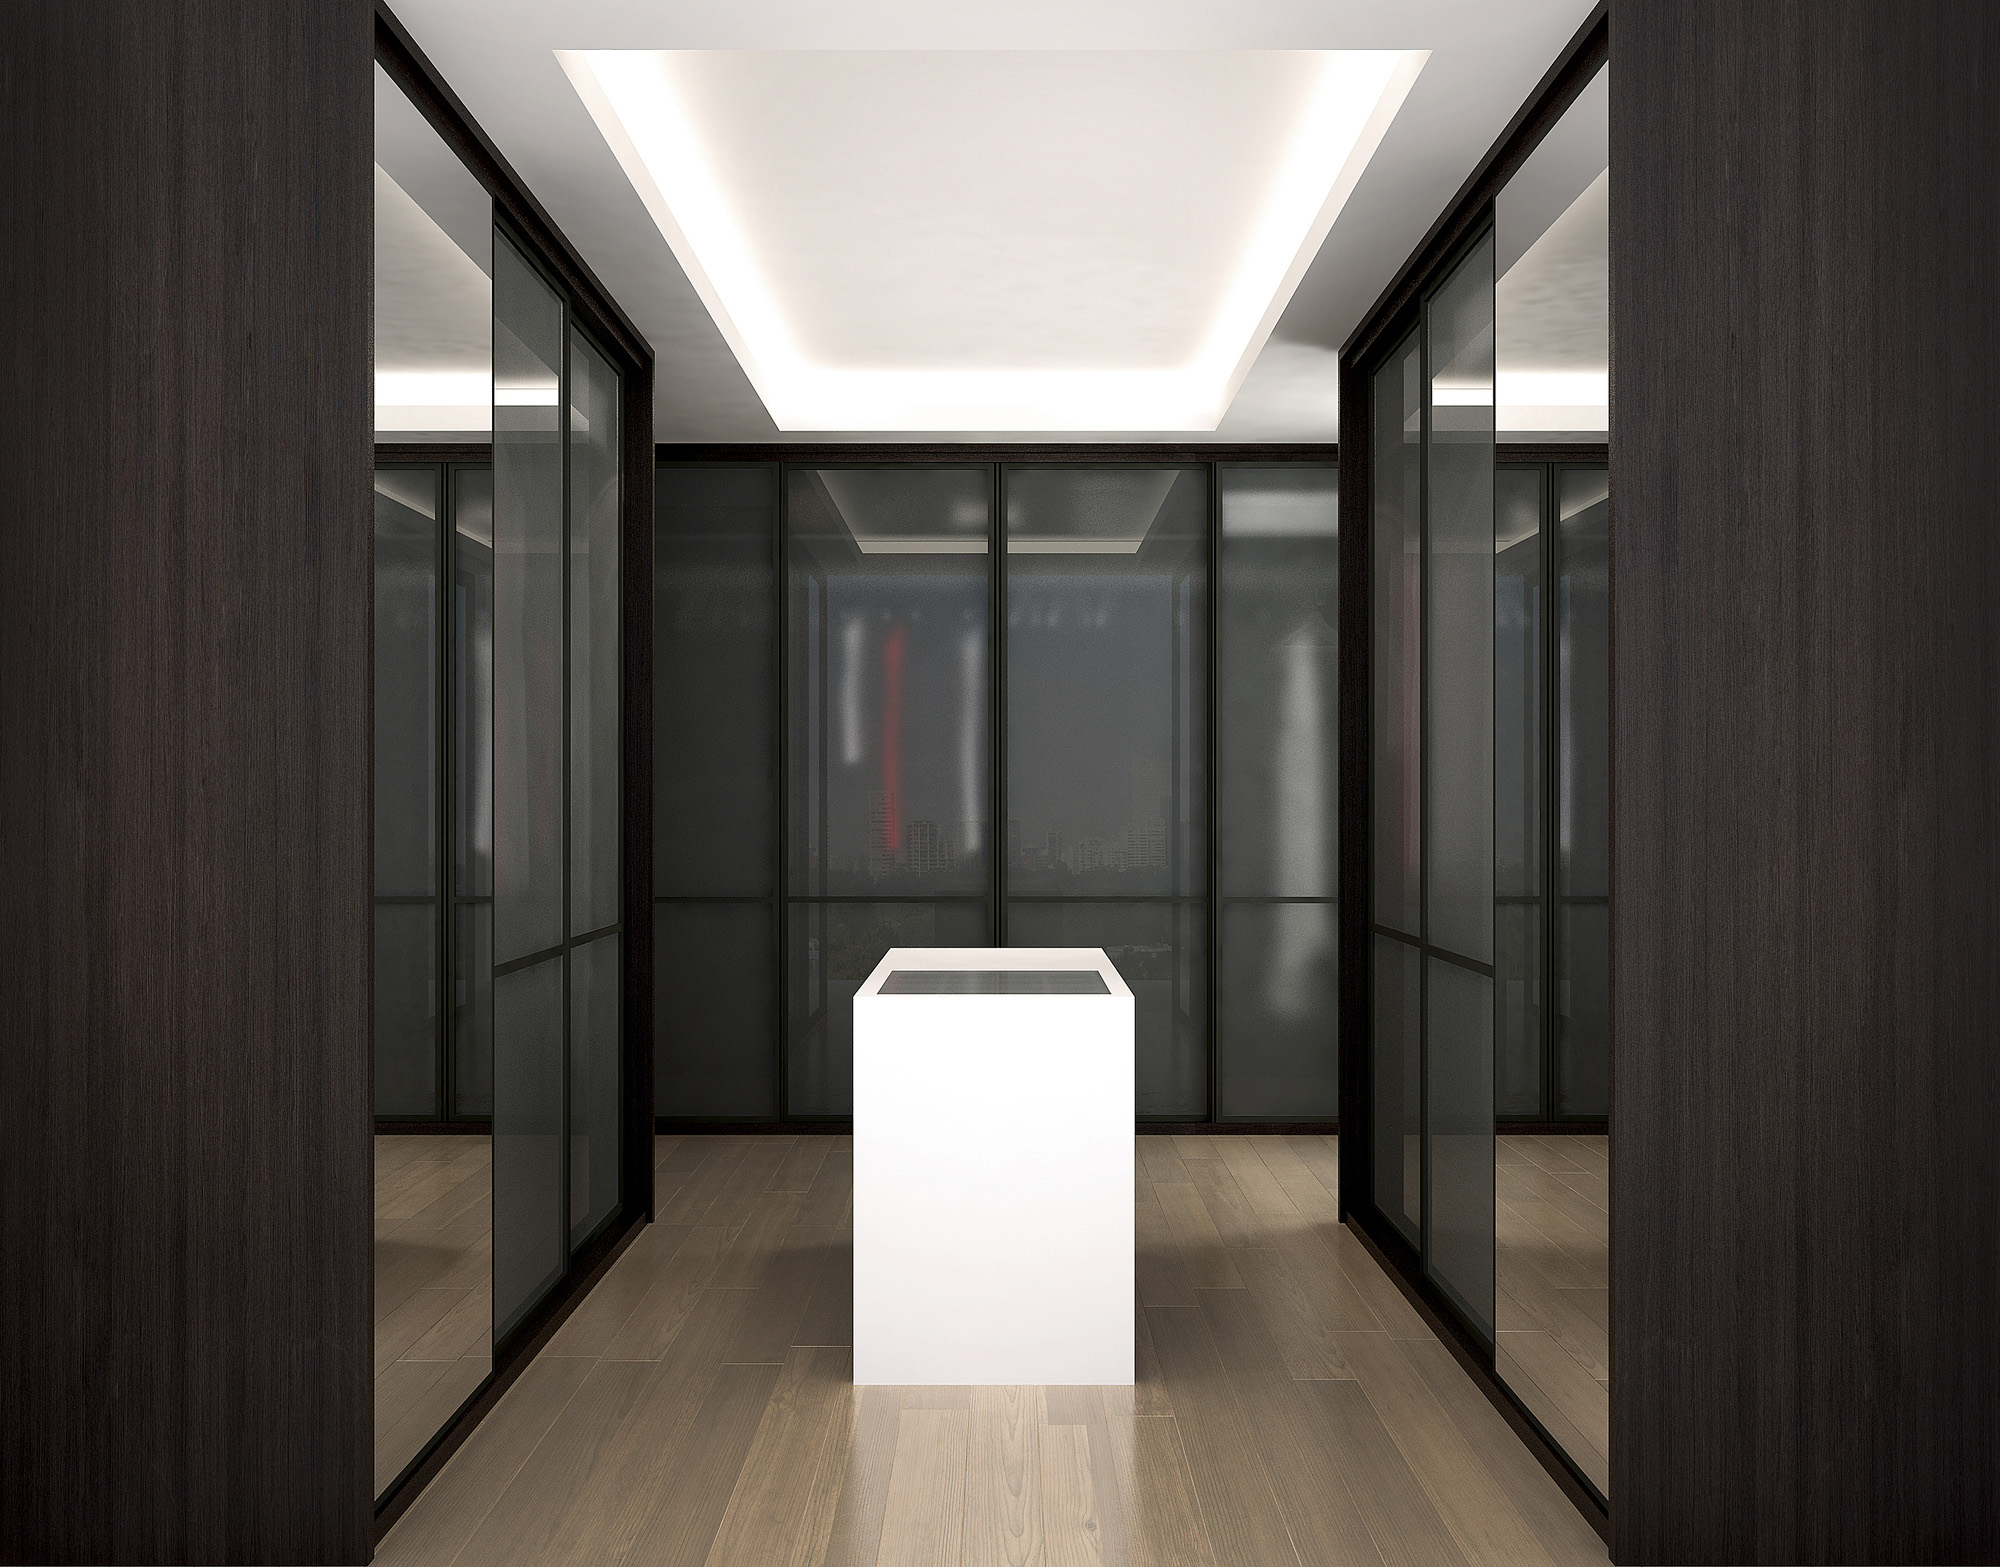 sliding mirrored wardrobes, fitted wardrobes, modern wardrobes, grey wardrobe doors